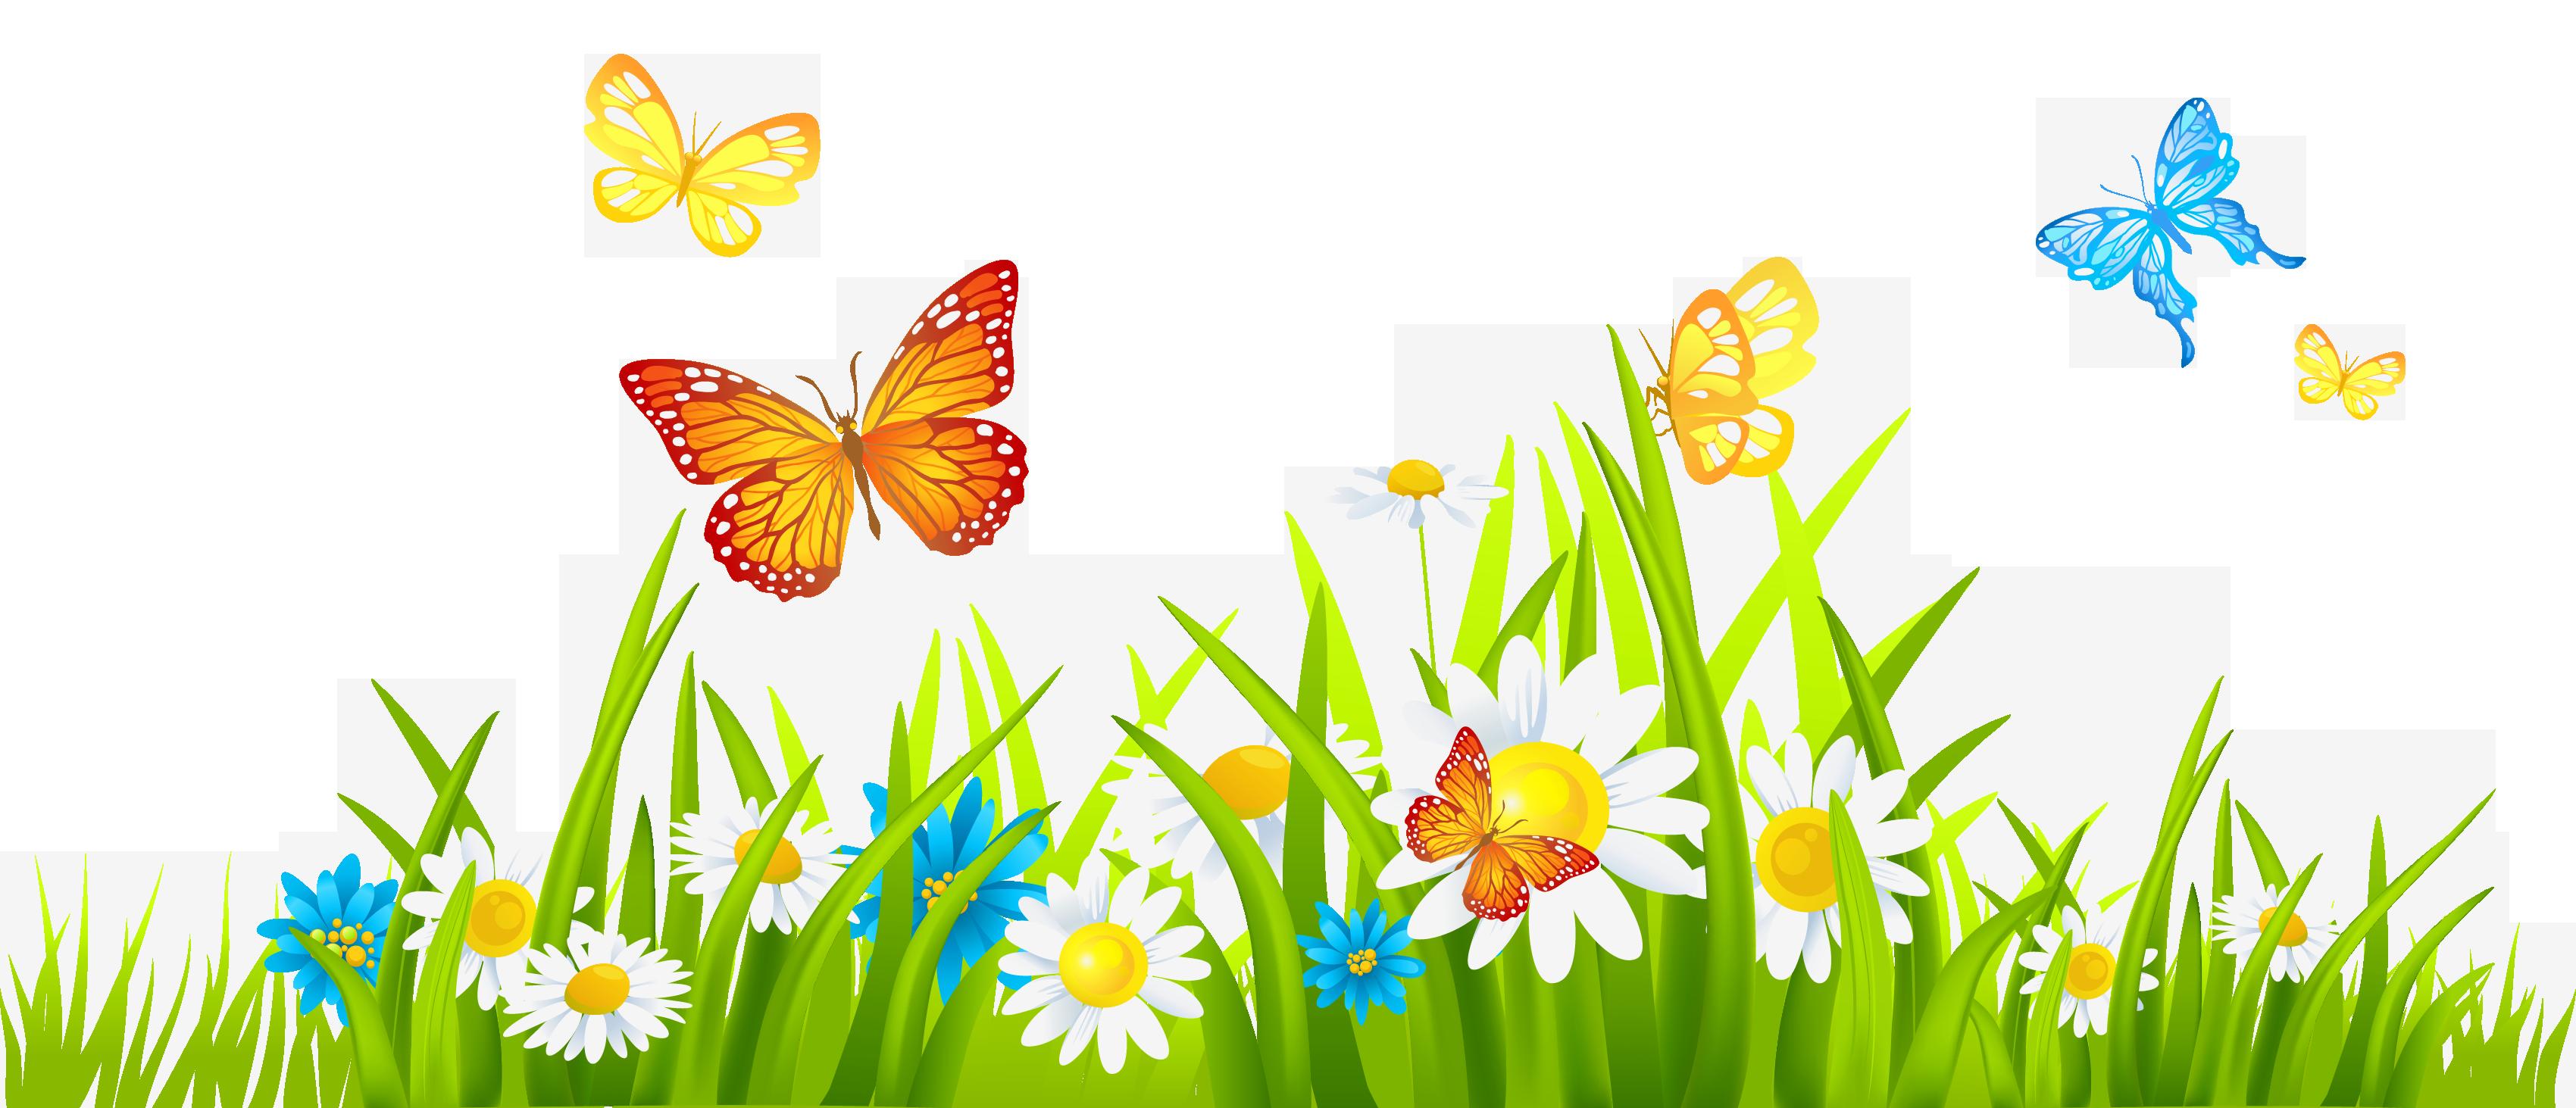 Grass and flowers clip art free clipart images clipartwiz clipartix.